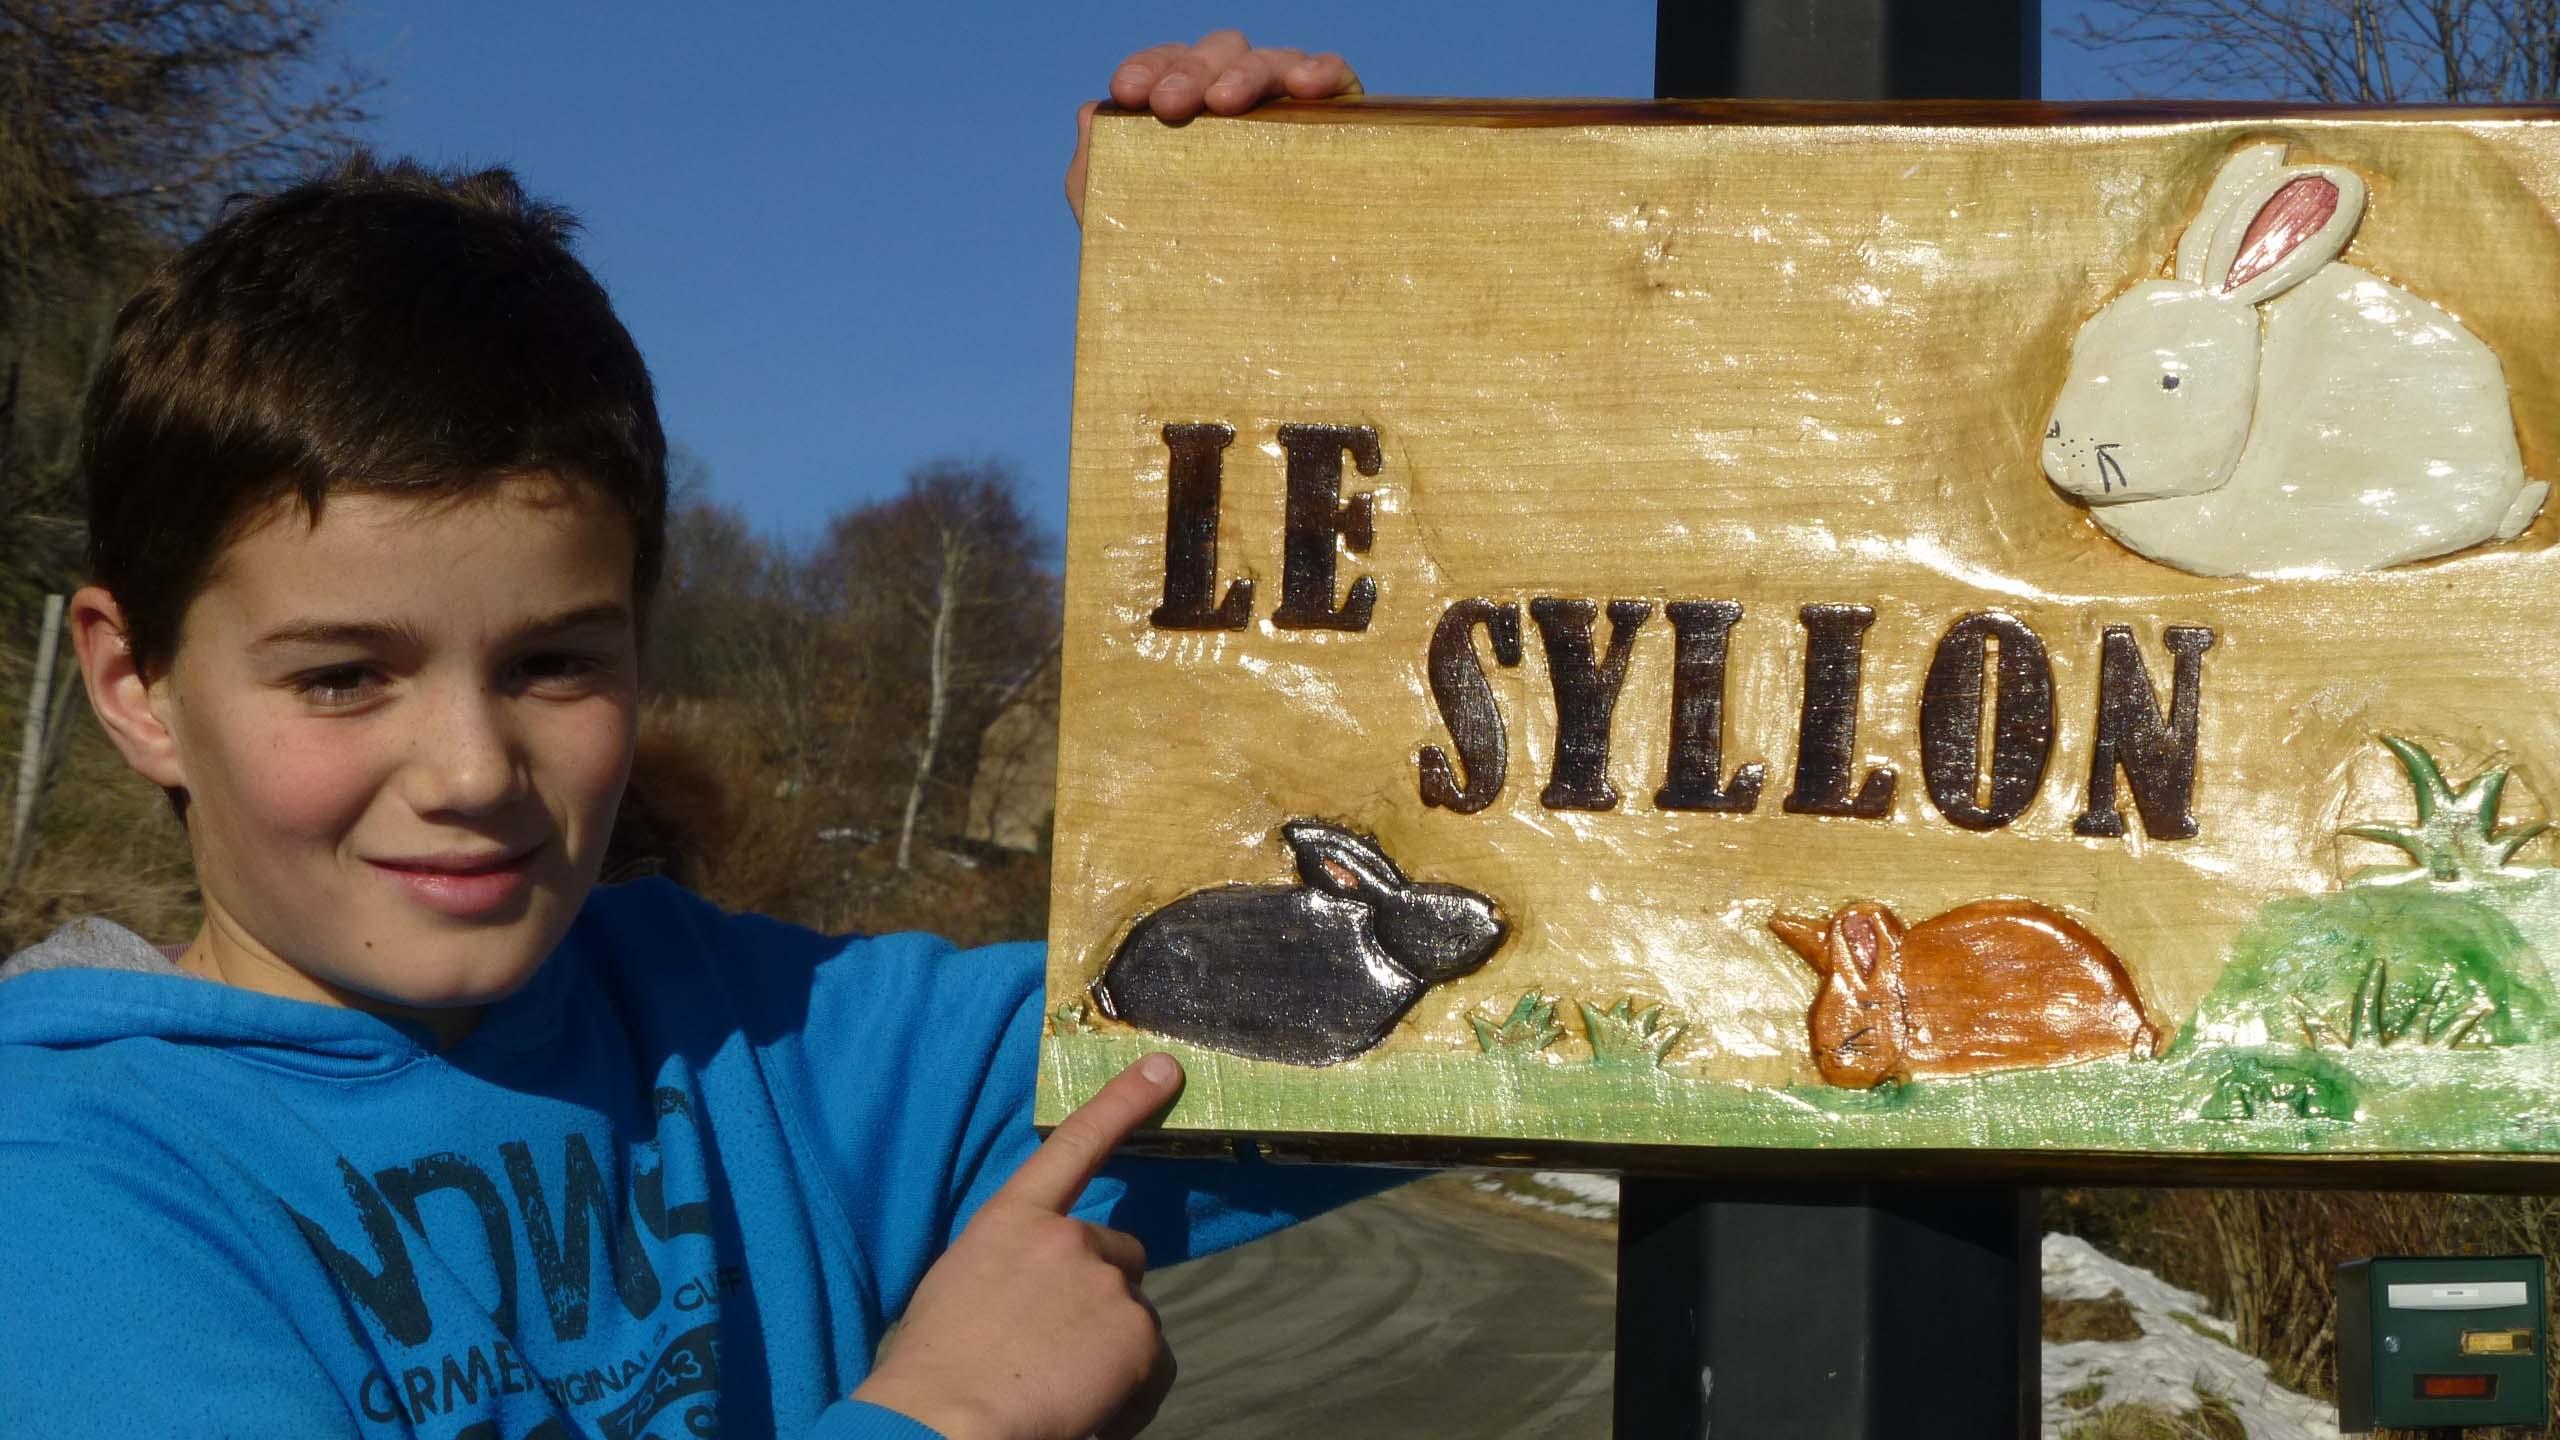 Le Syllon-All1.jpg